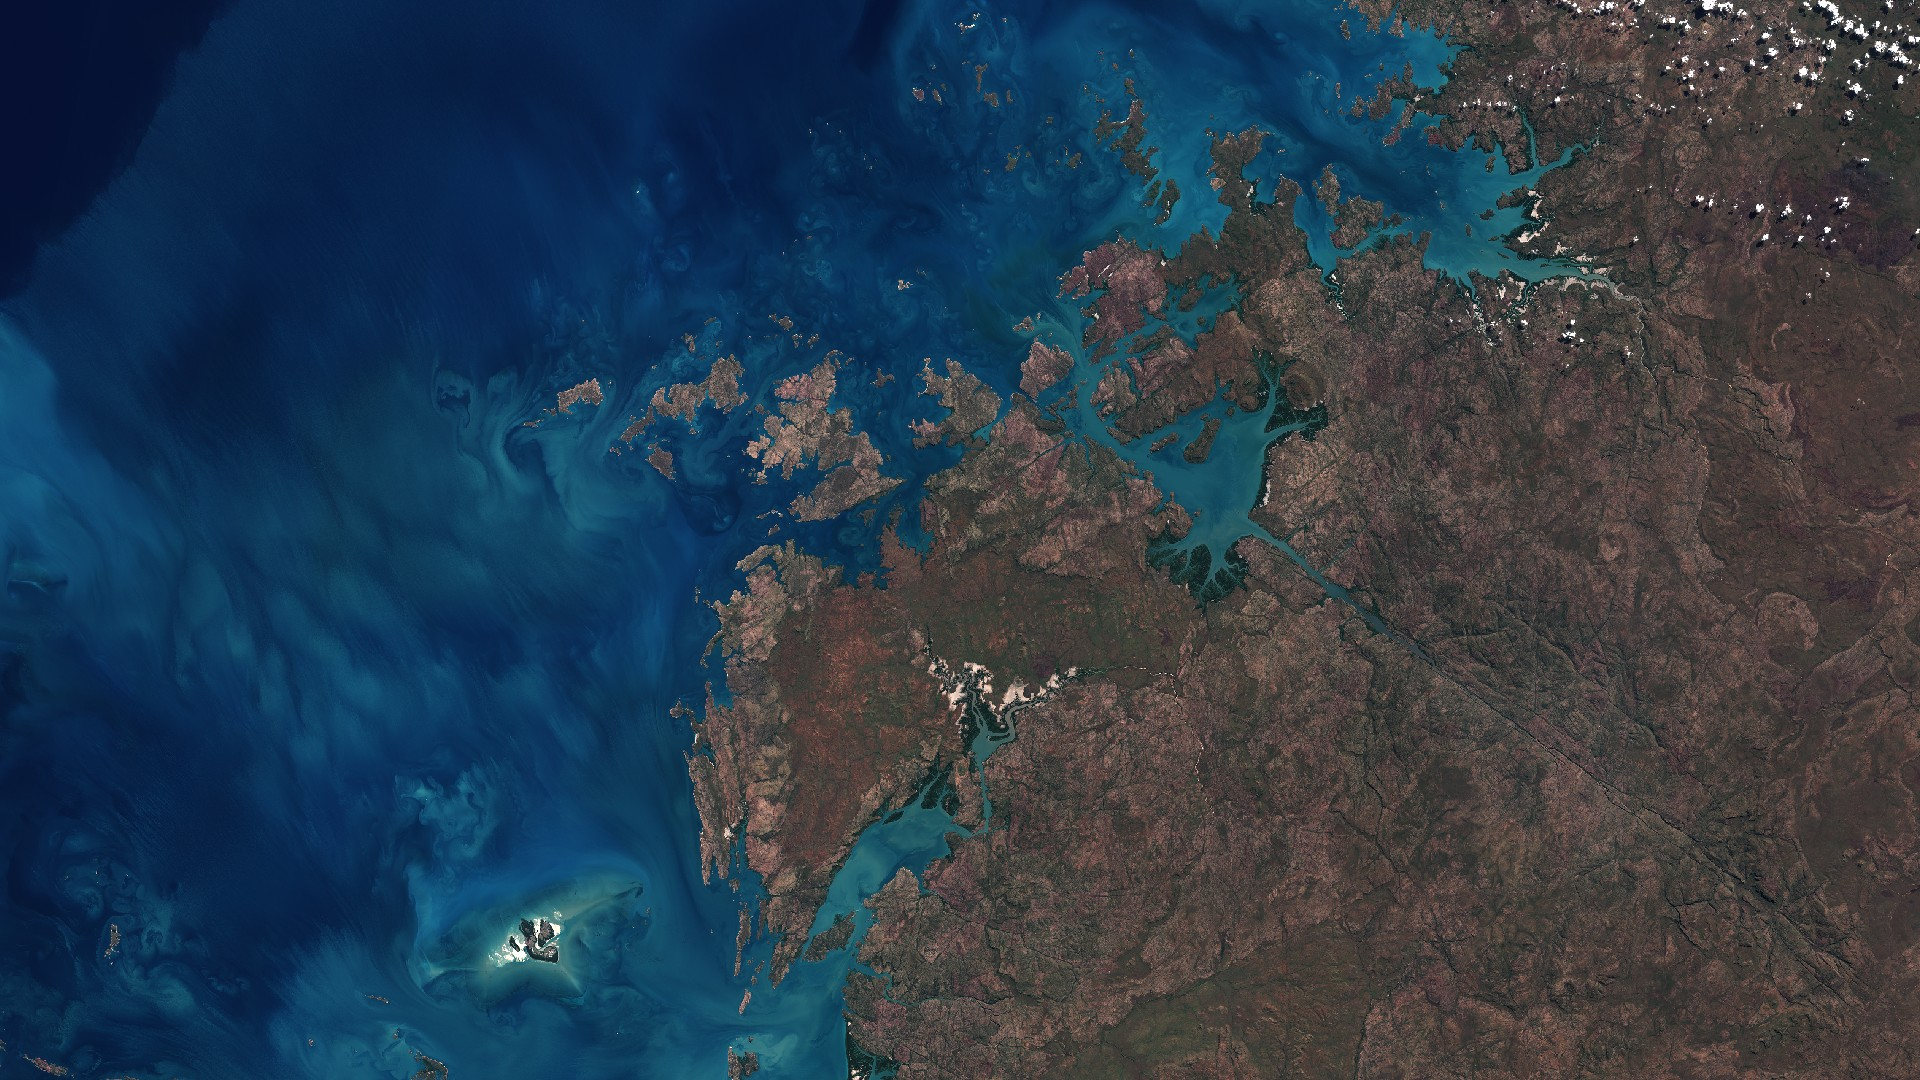 Calendrier spatial - Juin 2016 - Sentinel-2 - ESA - Copernicus - Australie - Kimberley - Derby - Prince Regent Reserve - UNESCO - Archipel Bonaparte - Augustus Island - Wurroolgu